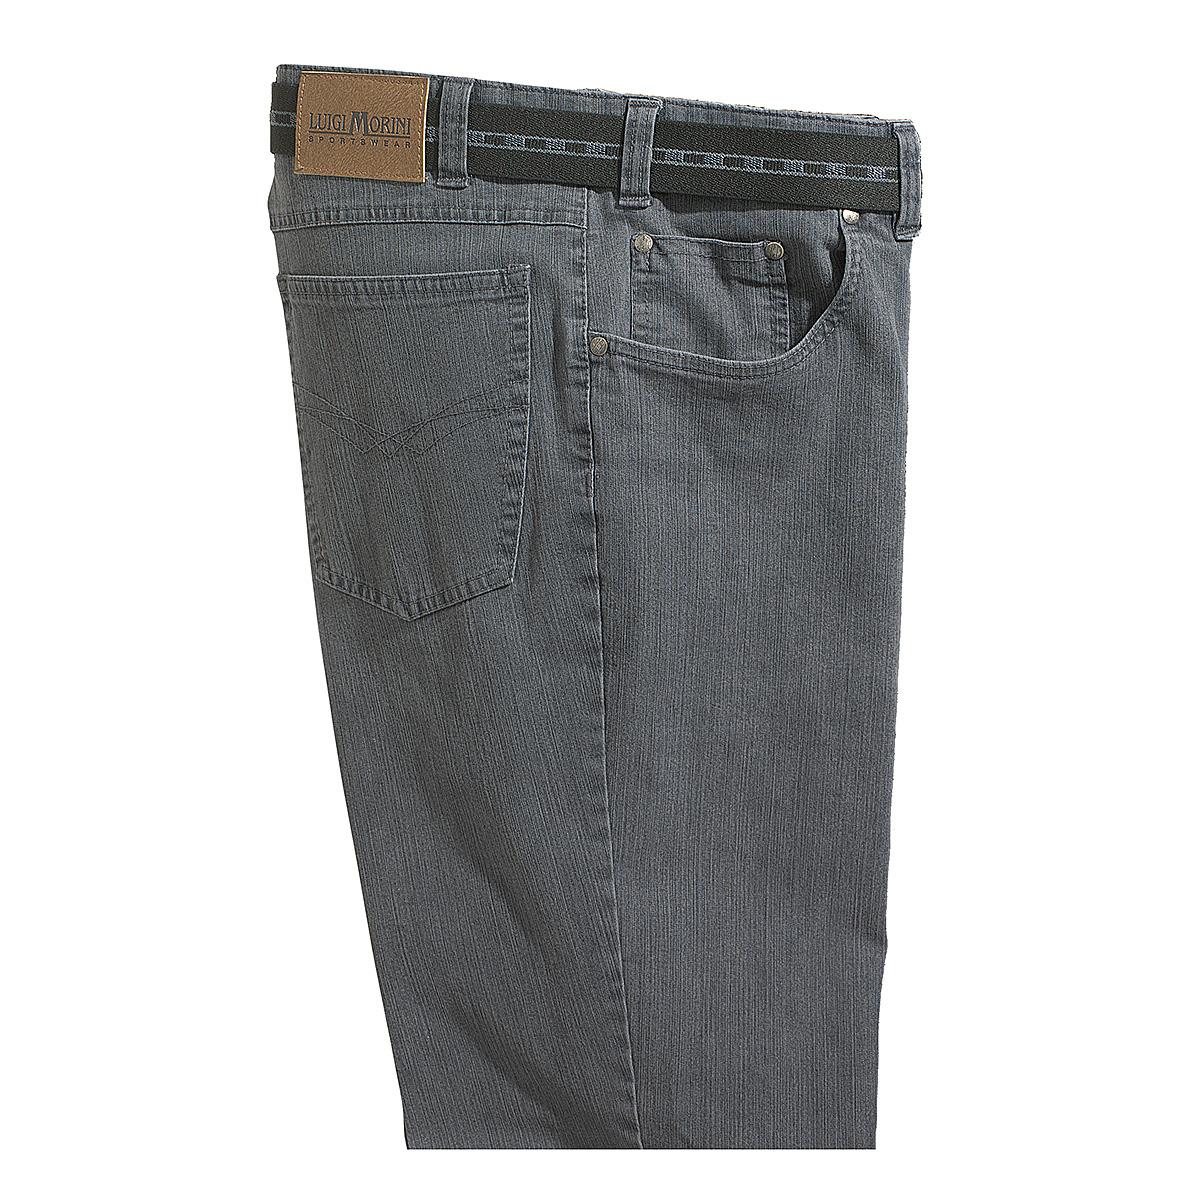 ring denim jeans farbe grau gr enspezialist m nnermode. Black Bedroom Furniture Sets. Home Design Ideas